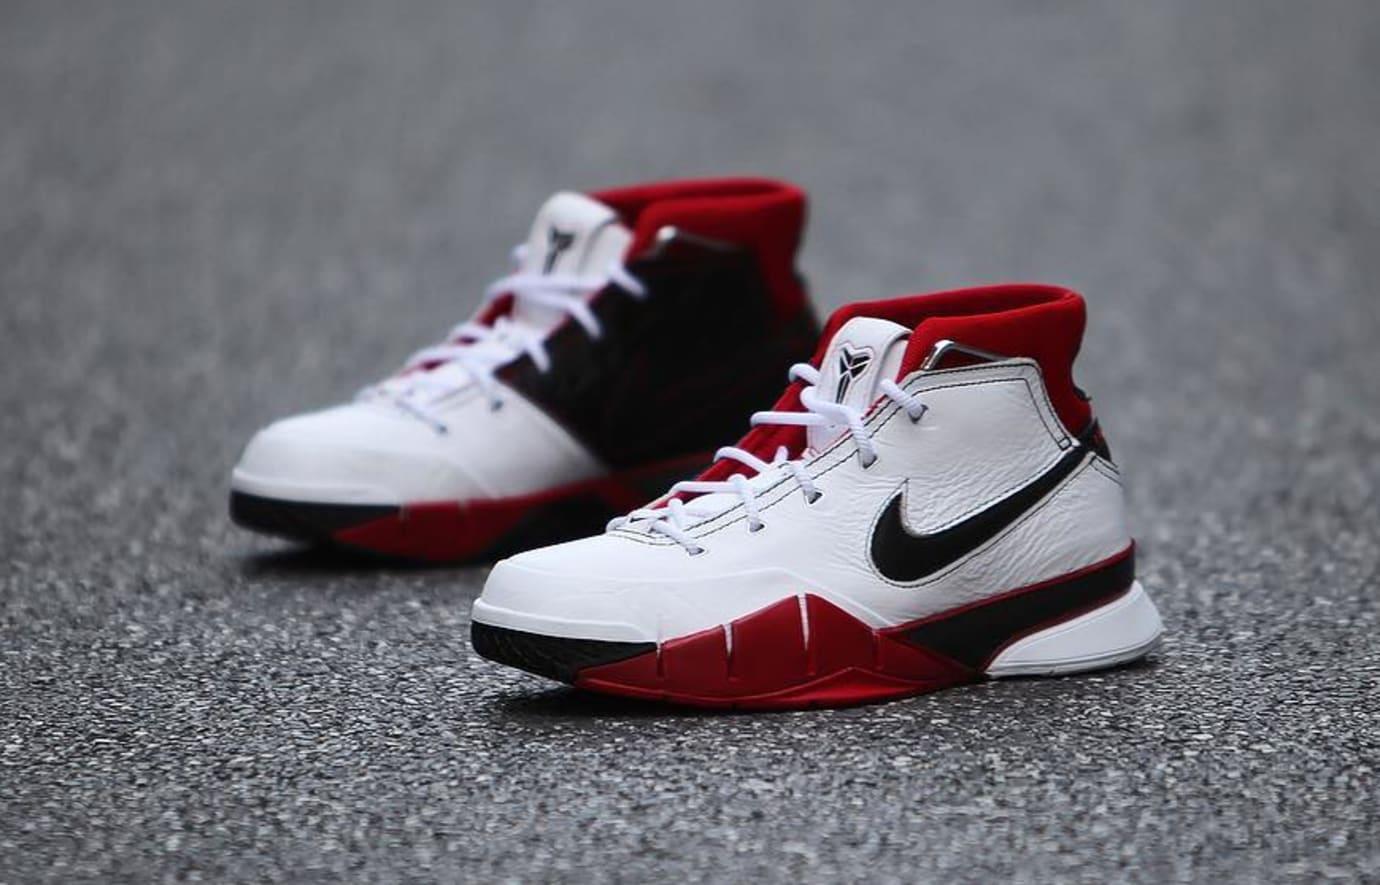 8020c145d7f9 Image via gc911 · Nike Zoom Kobe 1 Protro All-Star Release Date AQ2728-102  Left